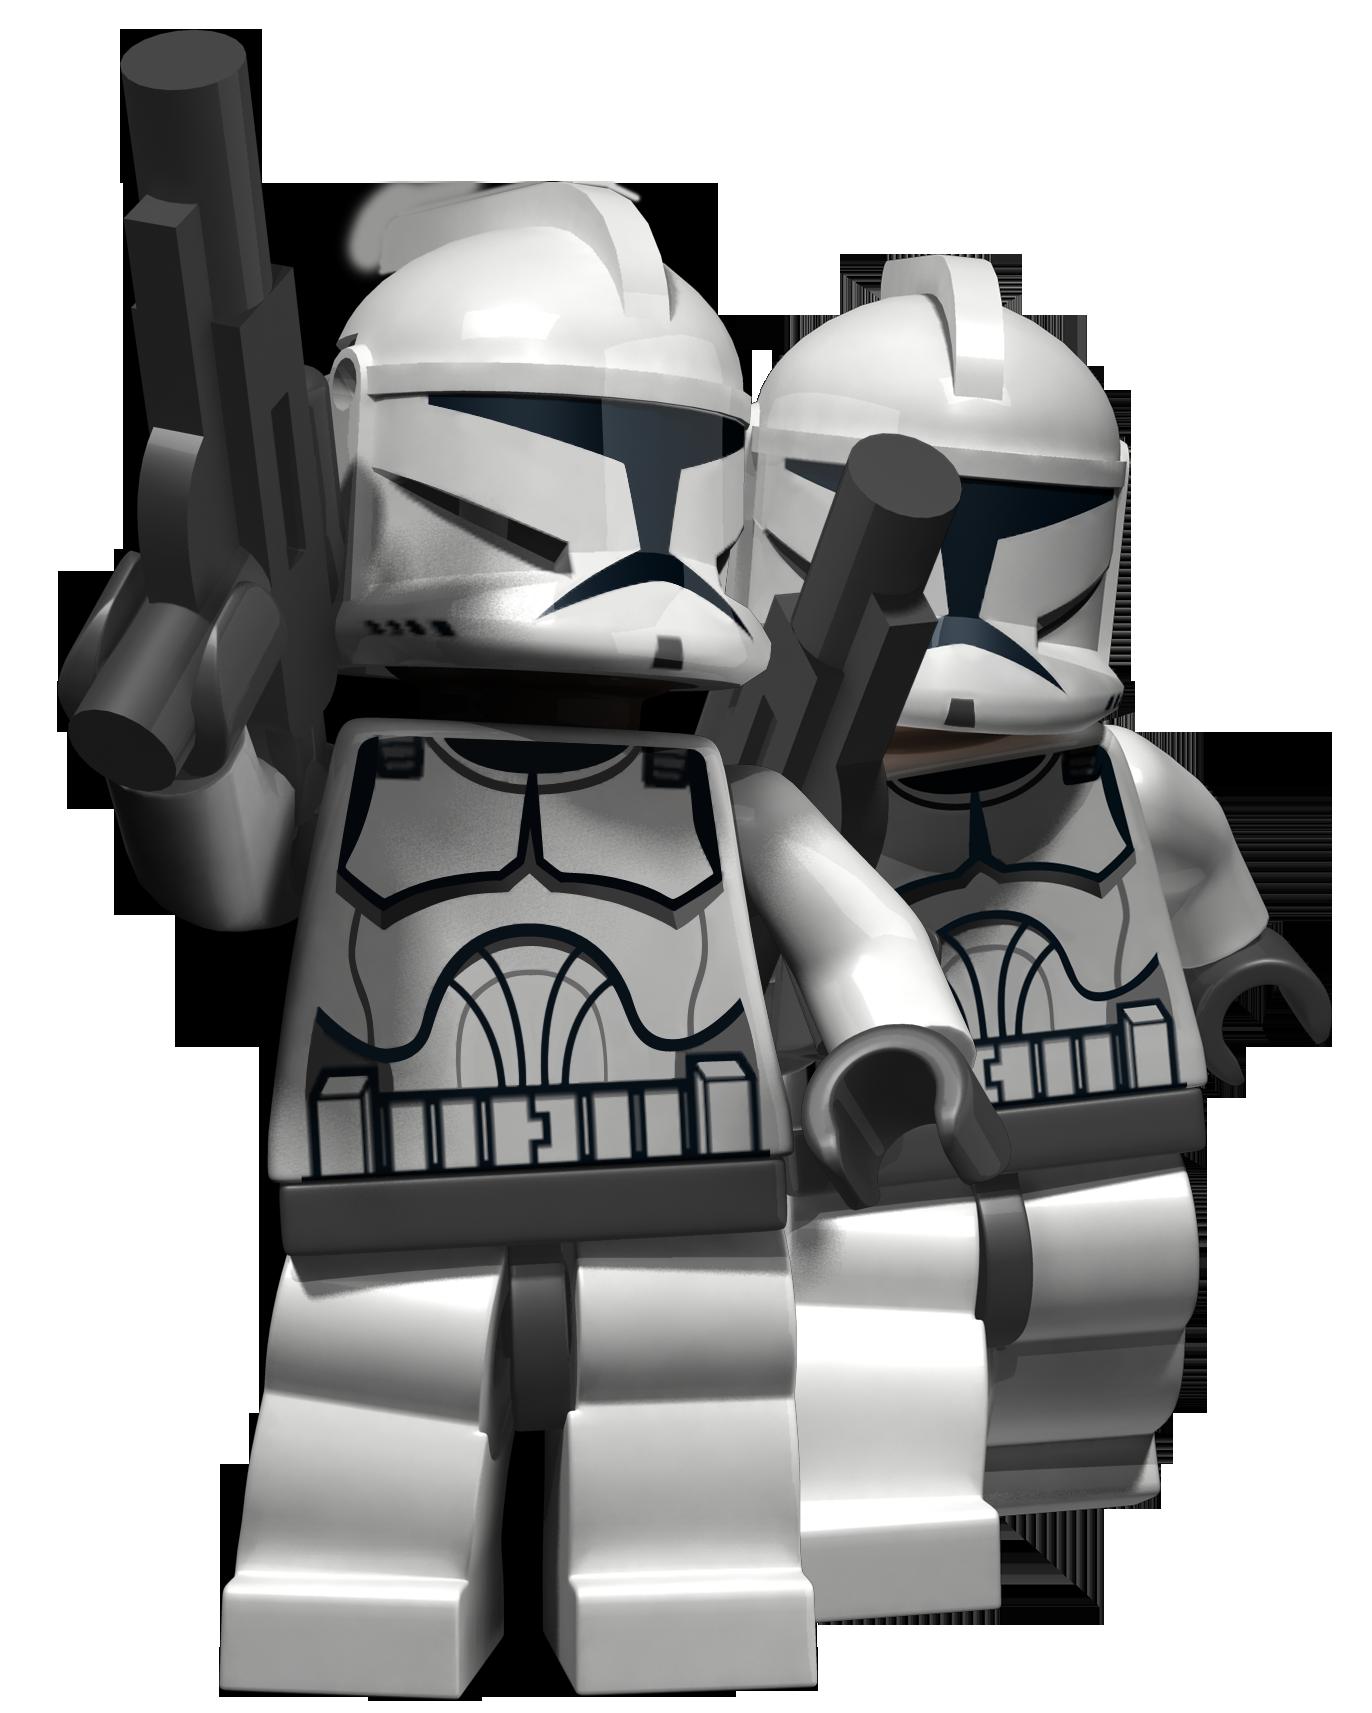 Clone Trooper (Lego Star Wars)